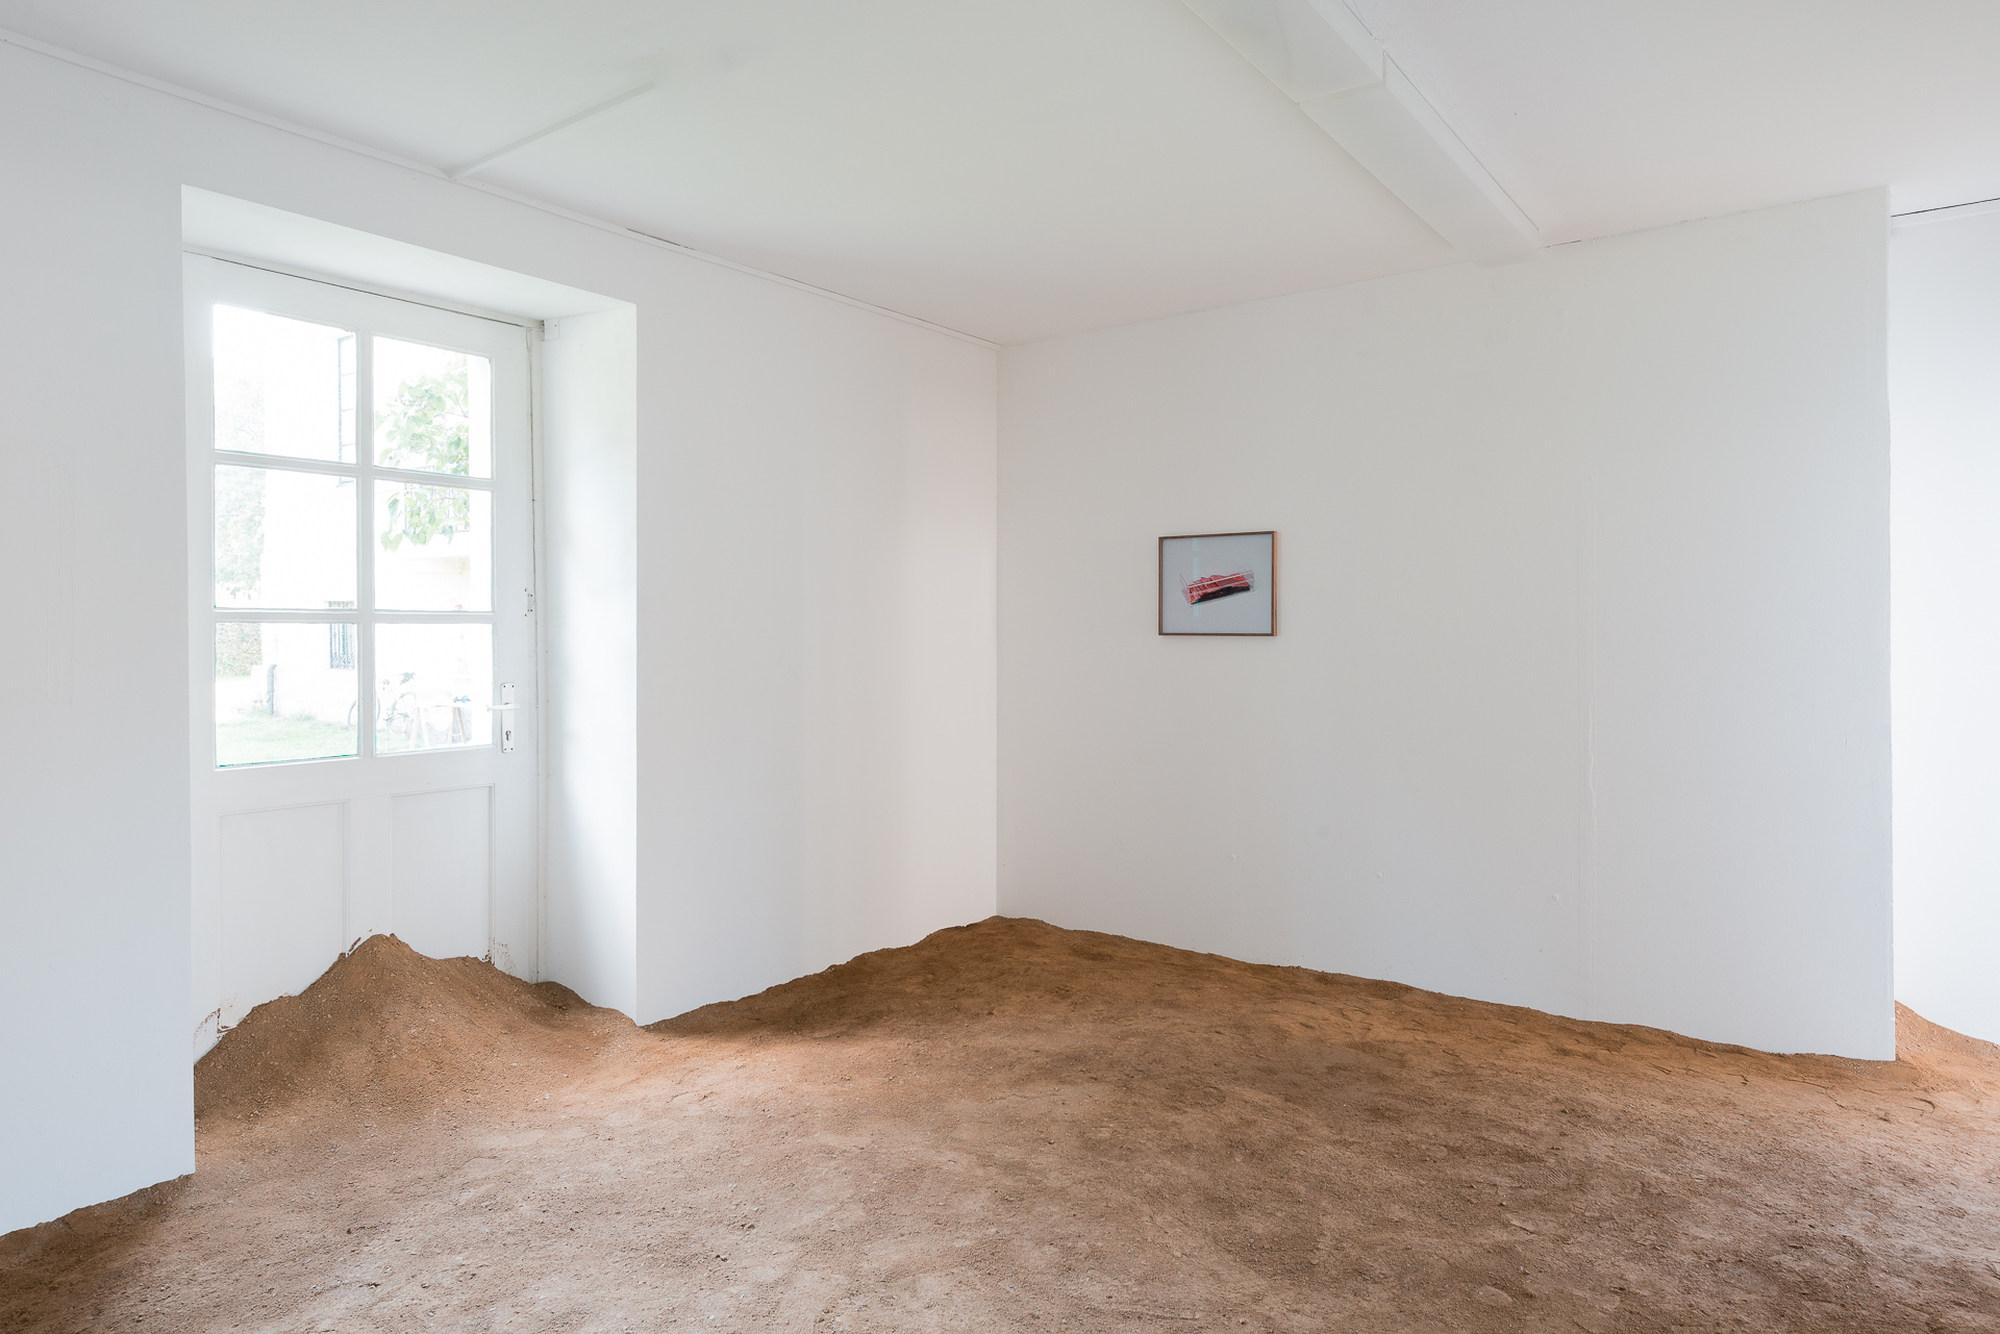 Anca Munteanu Rimnic at Kunstverein Braunschweig 9